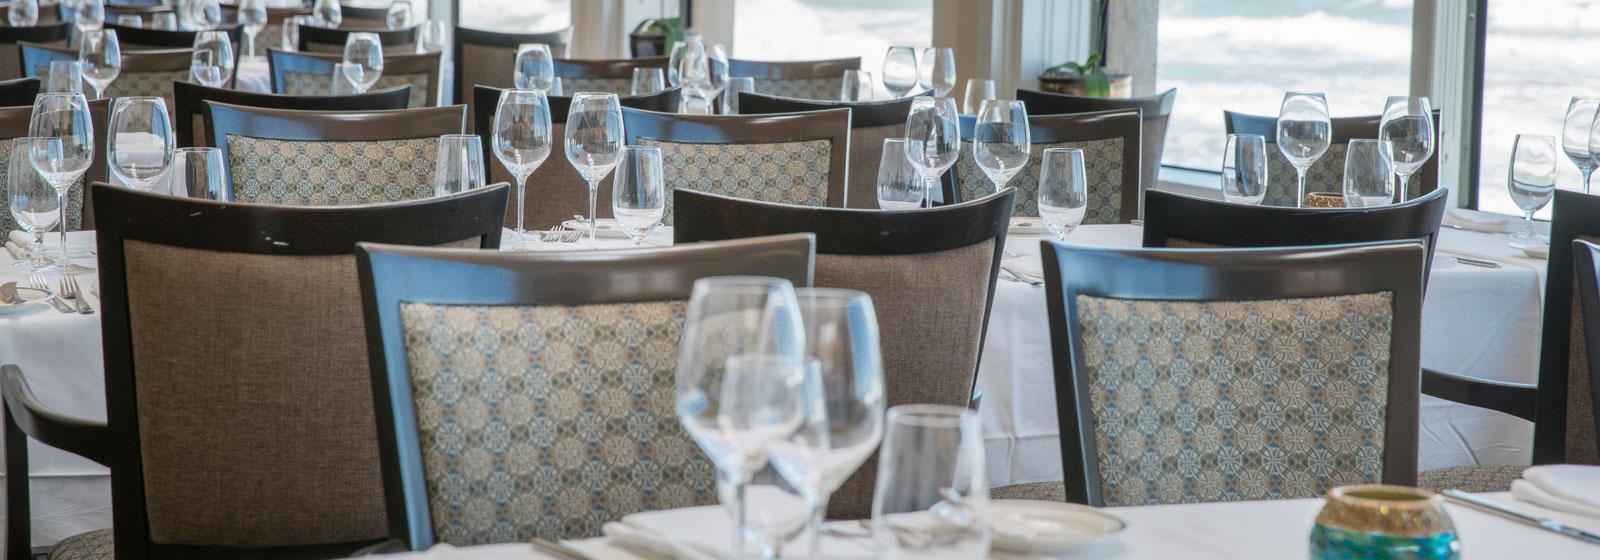 Marine Room Restaurant, La Jolla